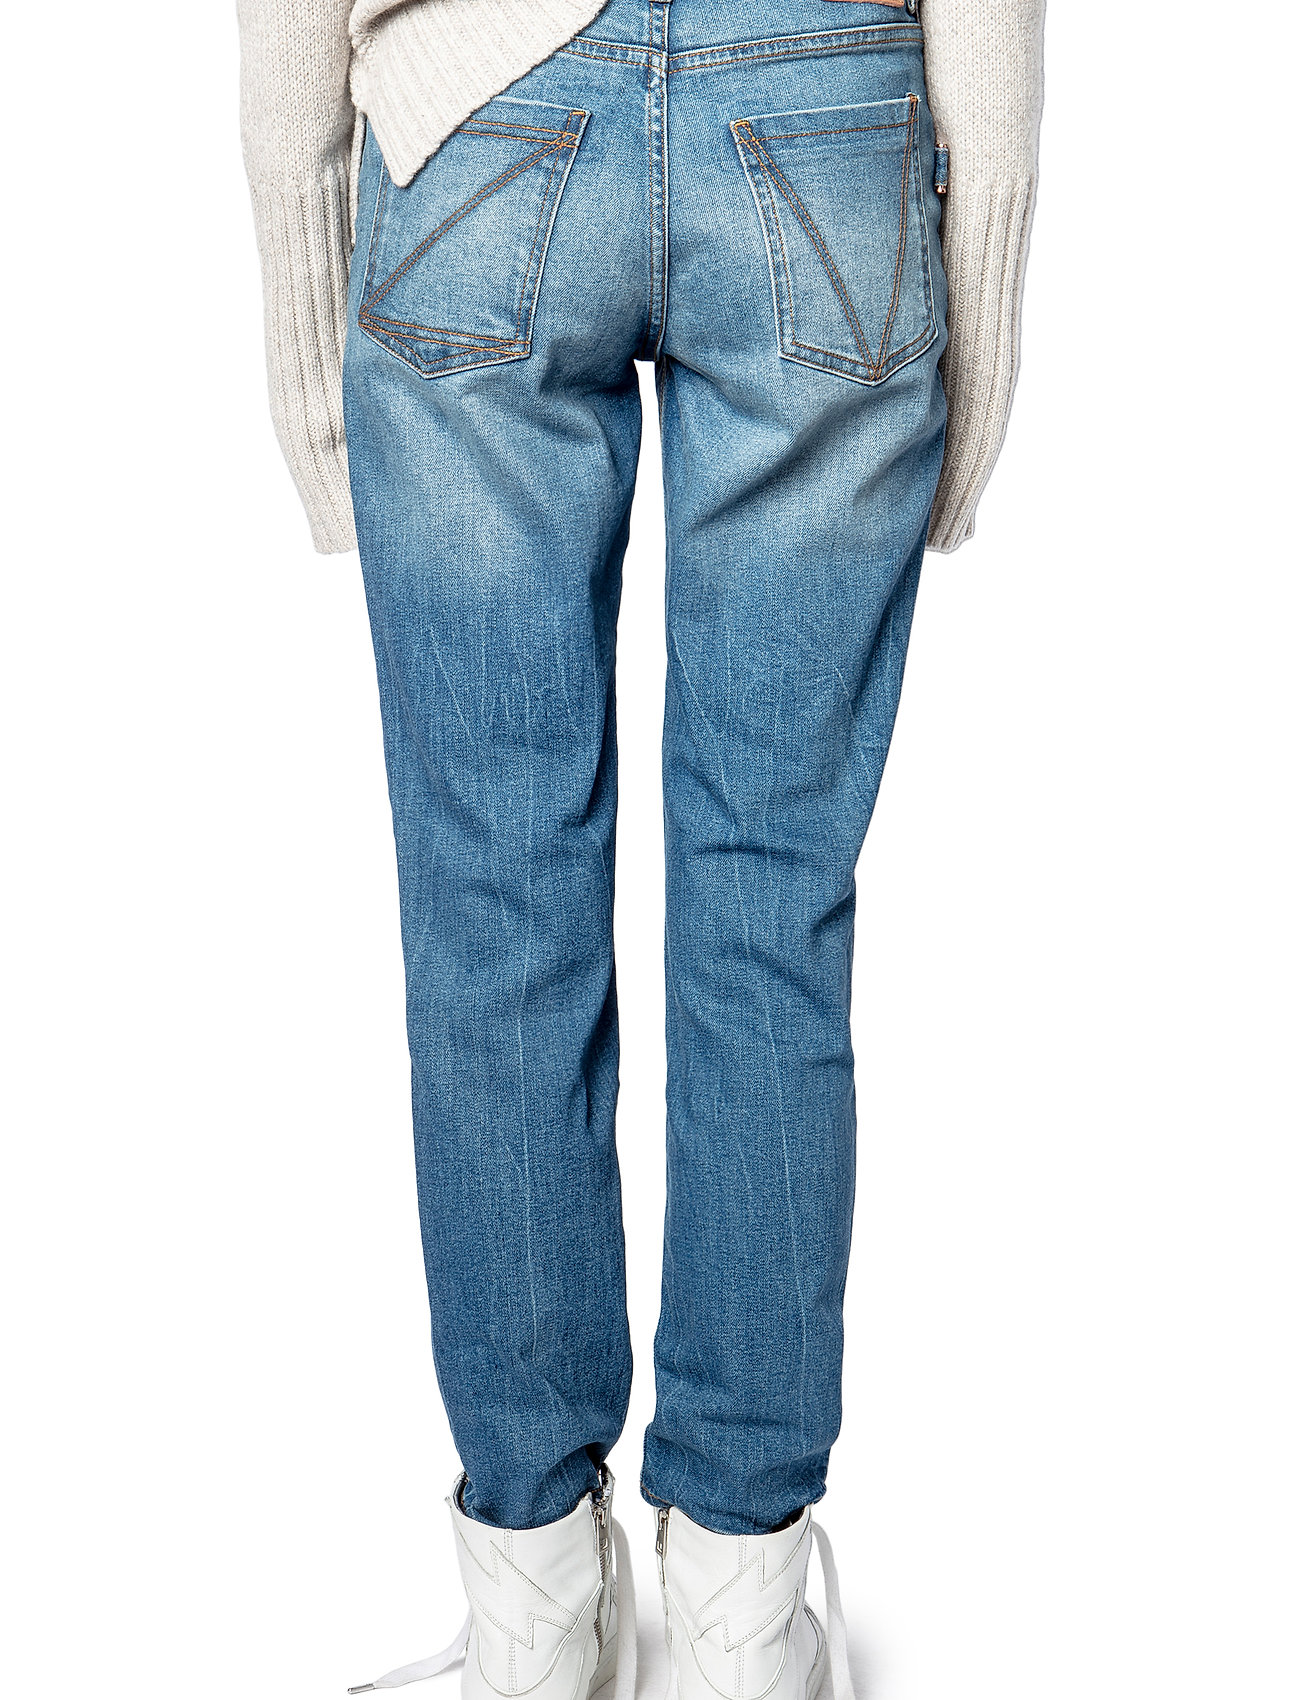 Zadig & Voltaire - MAMMA DENIM ECO LIGHT DENIM - straight jeans - light blue - 5